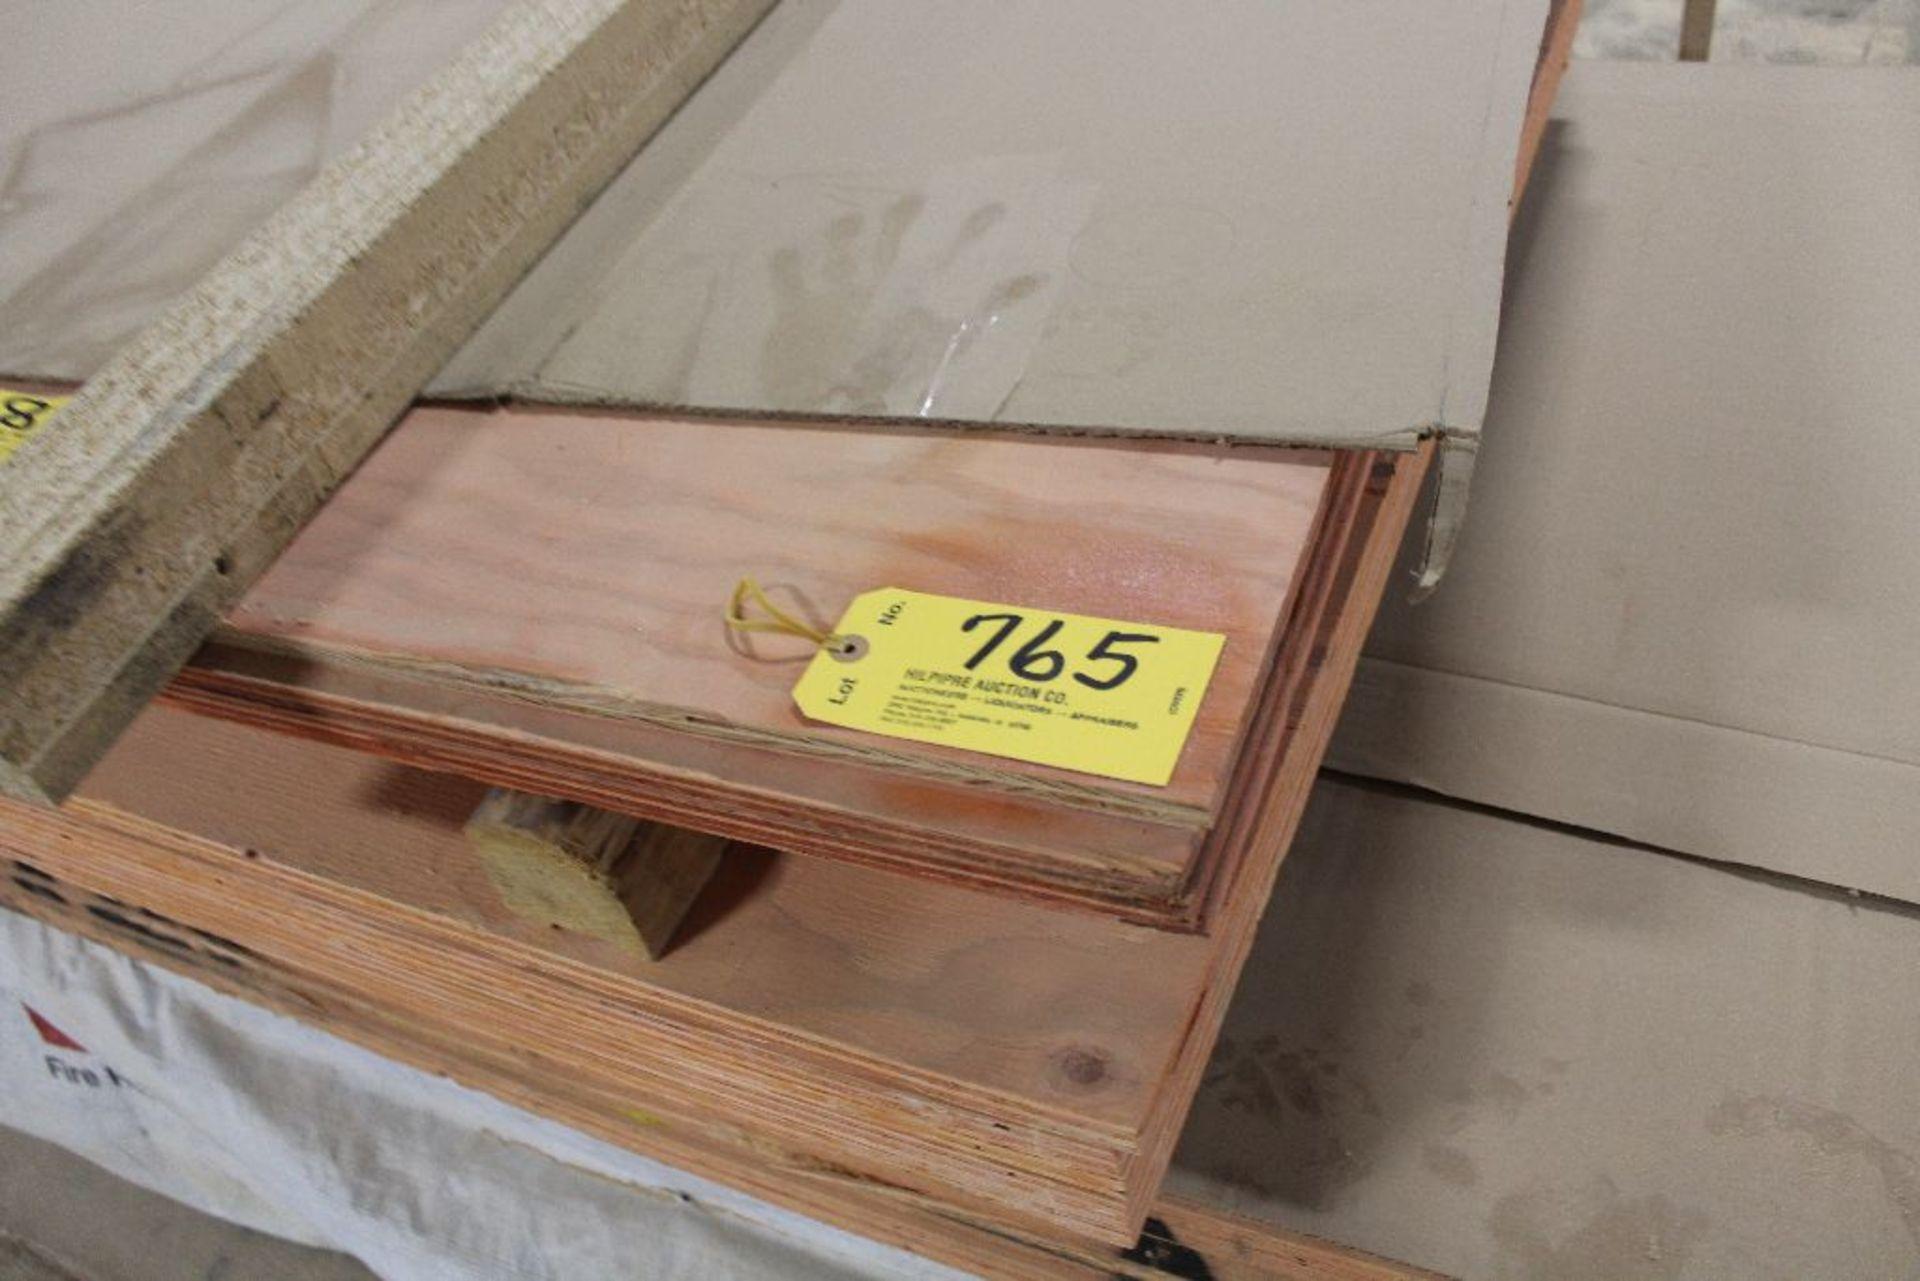 "Lot 765 - Lumber, (40) Fire retardent playwood, 3/4"" x 4' x 10': (5) 3/4"" 4' x 8';(4) 1/2"" 4' x 8'; (2) 1/7"" 4"